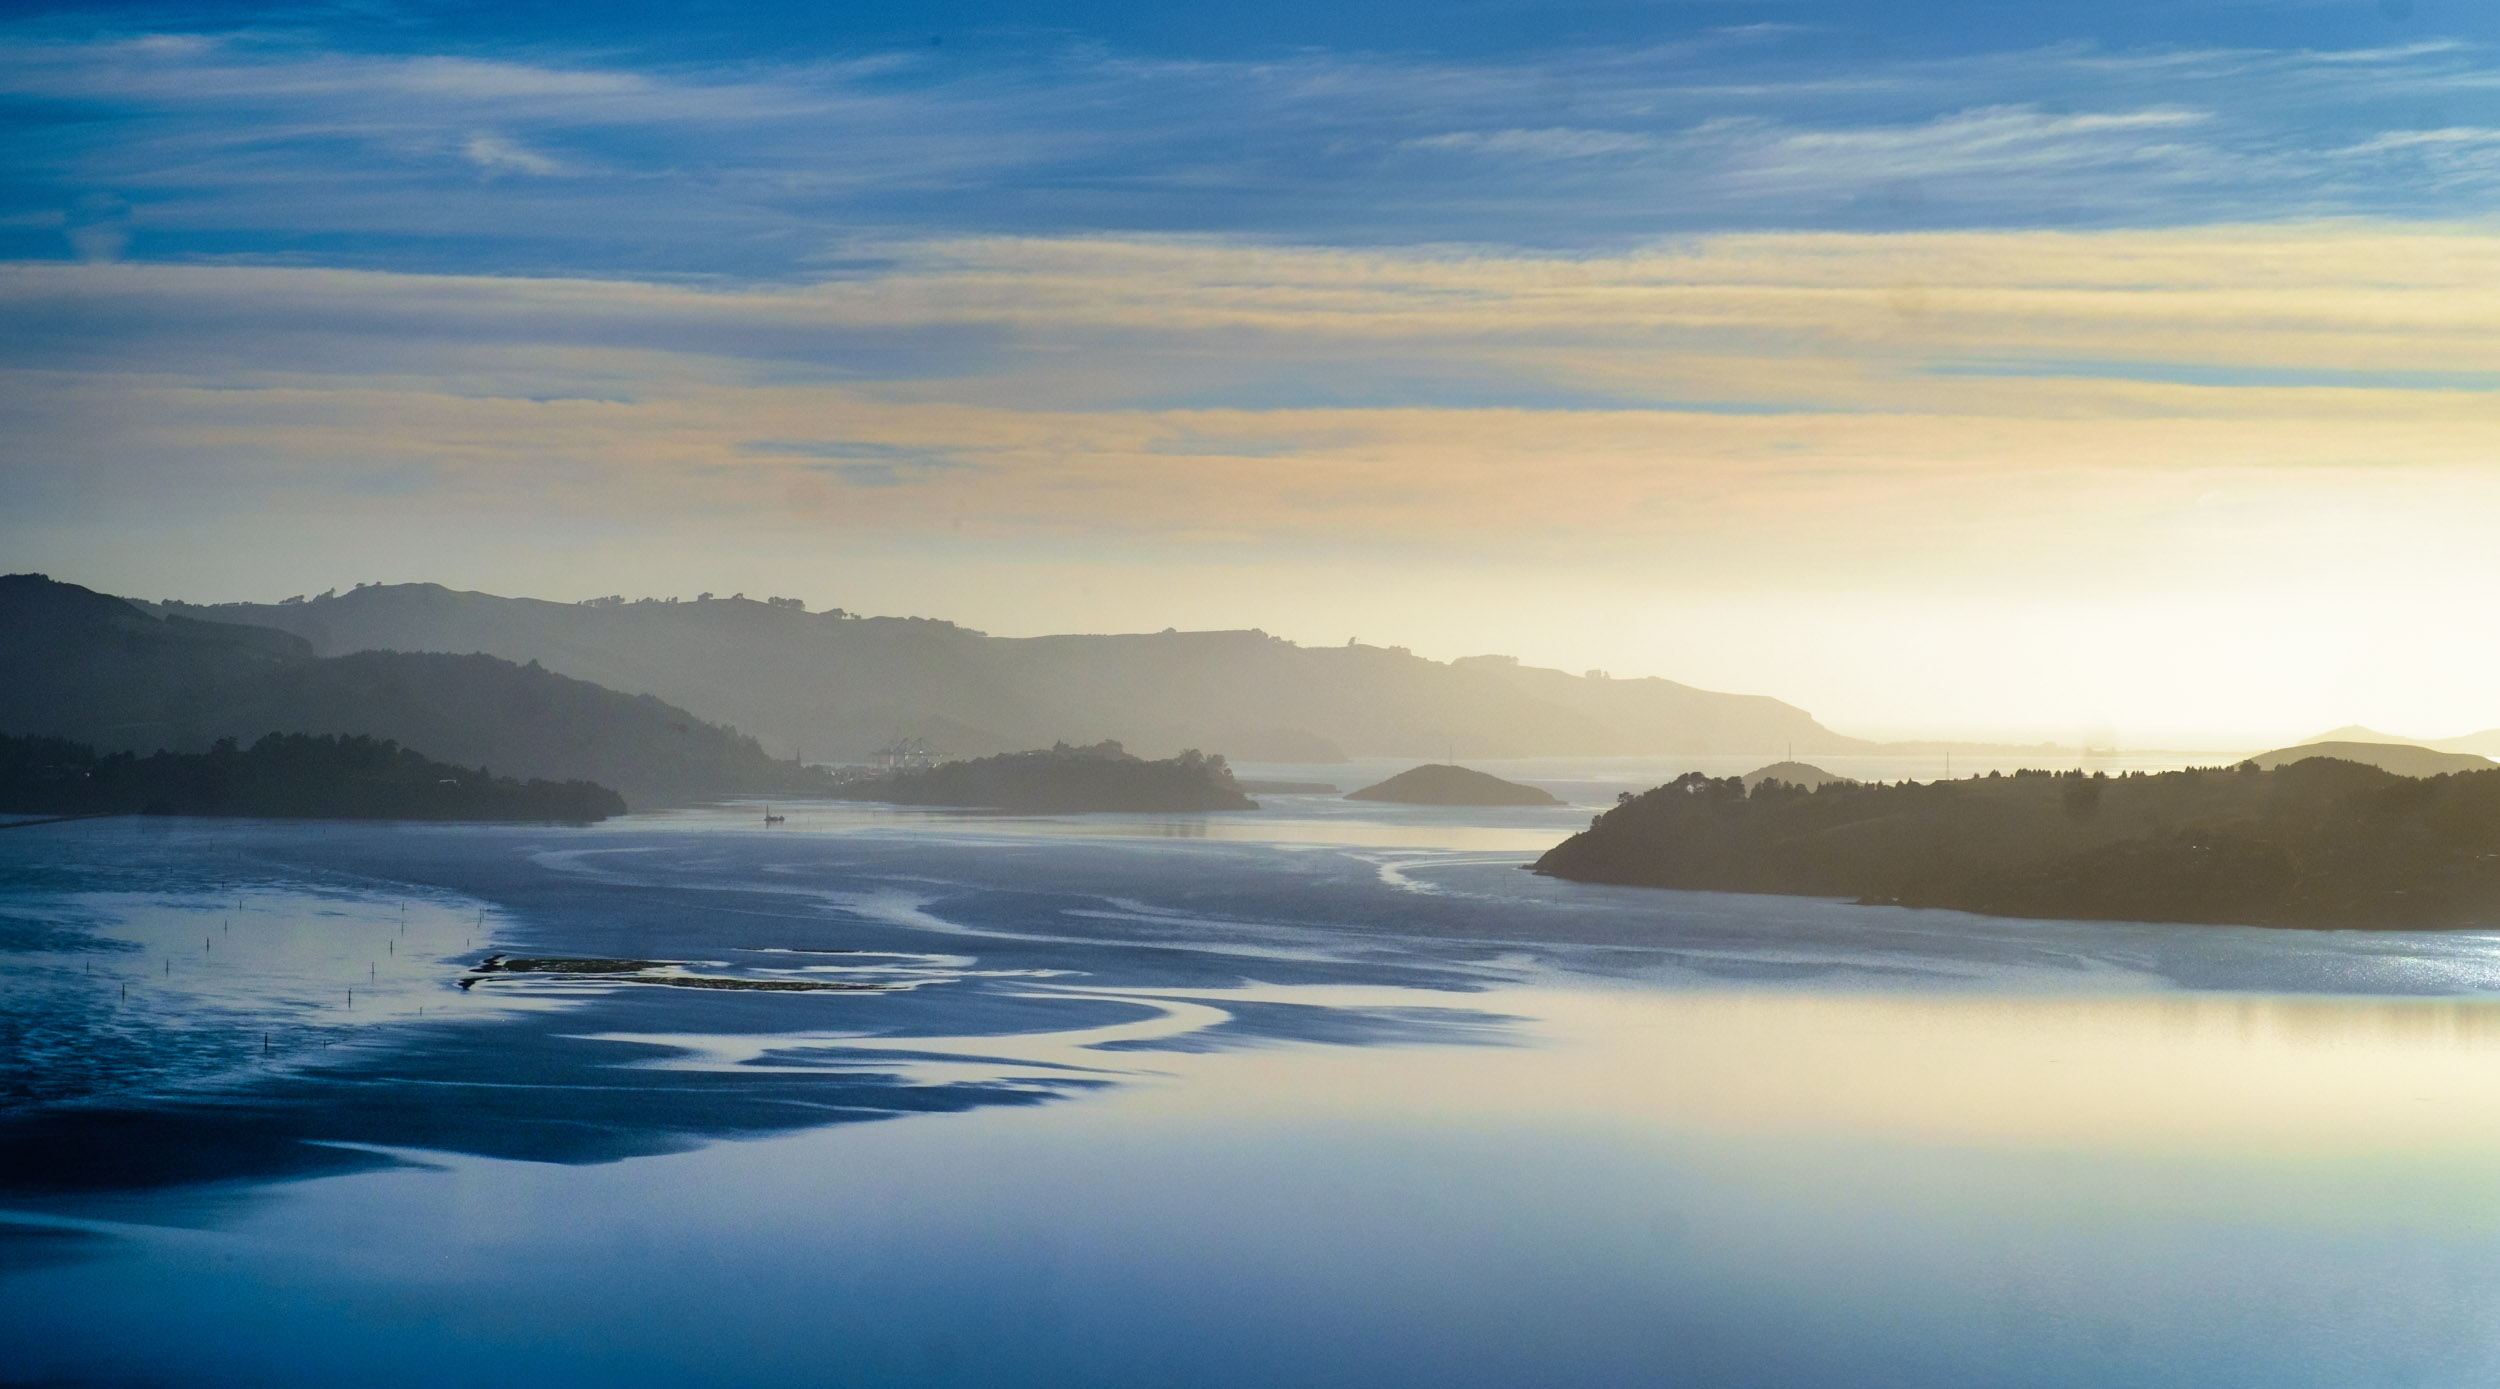 Otago Harbour inlet, Dunedin